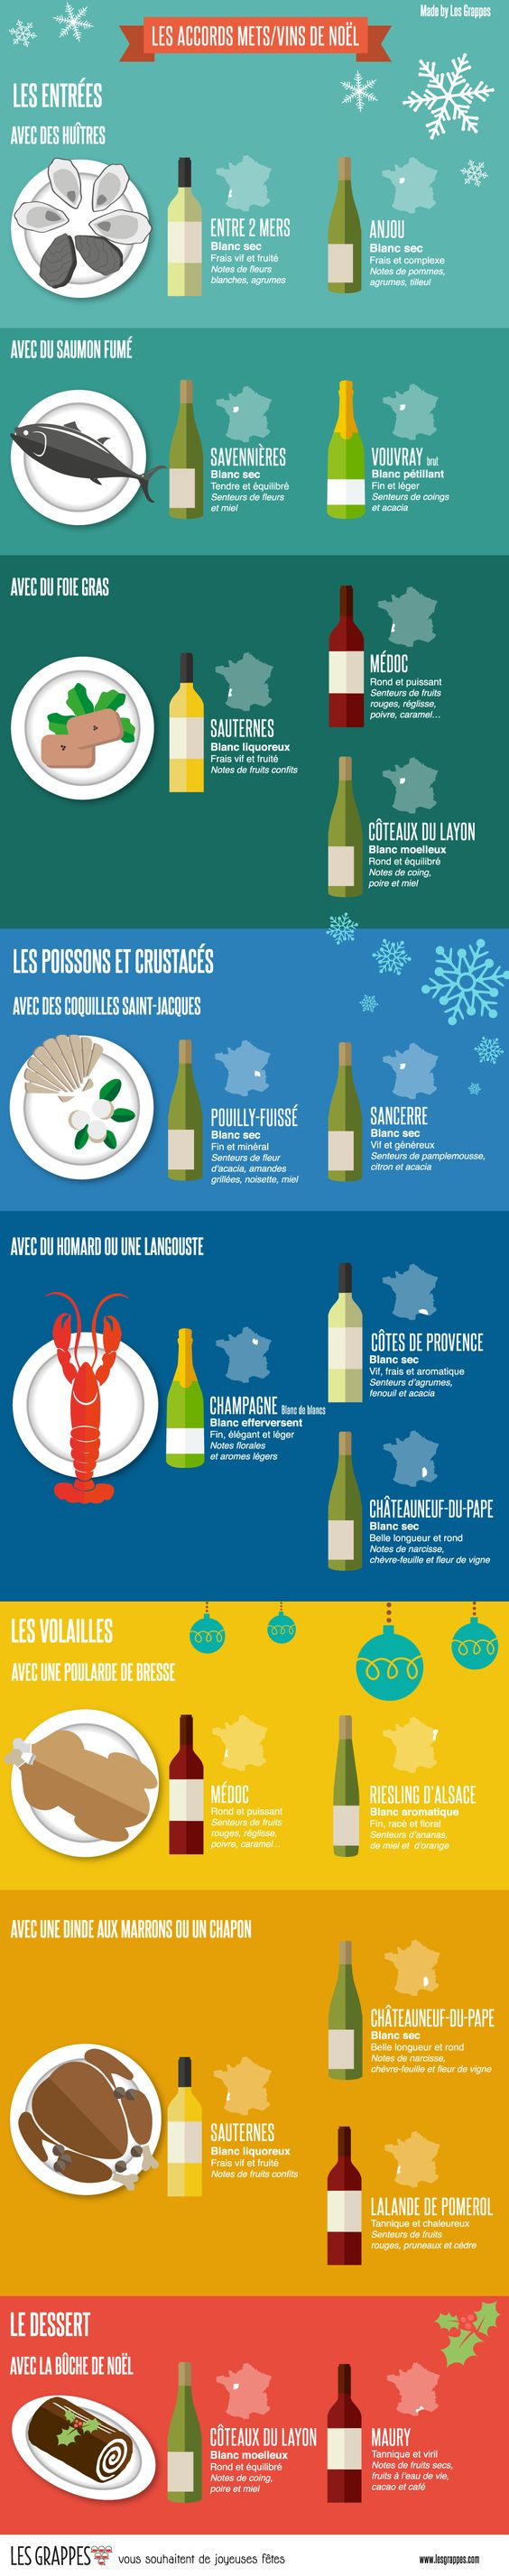 Les accors mets/vins de Noël par #lesgrappes